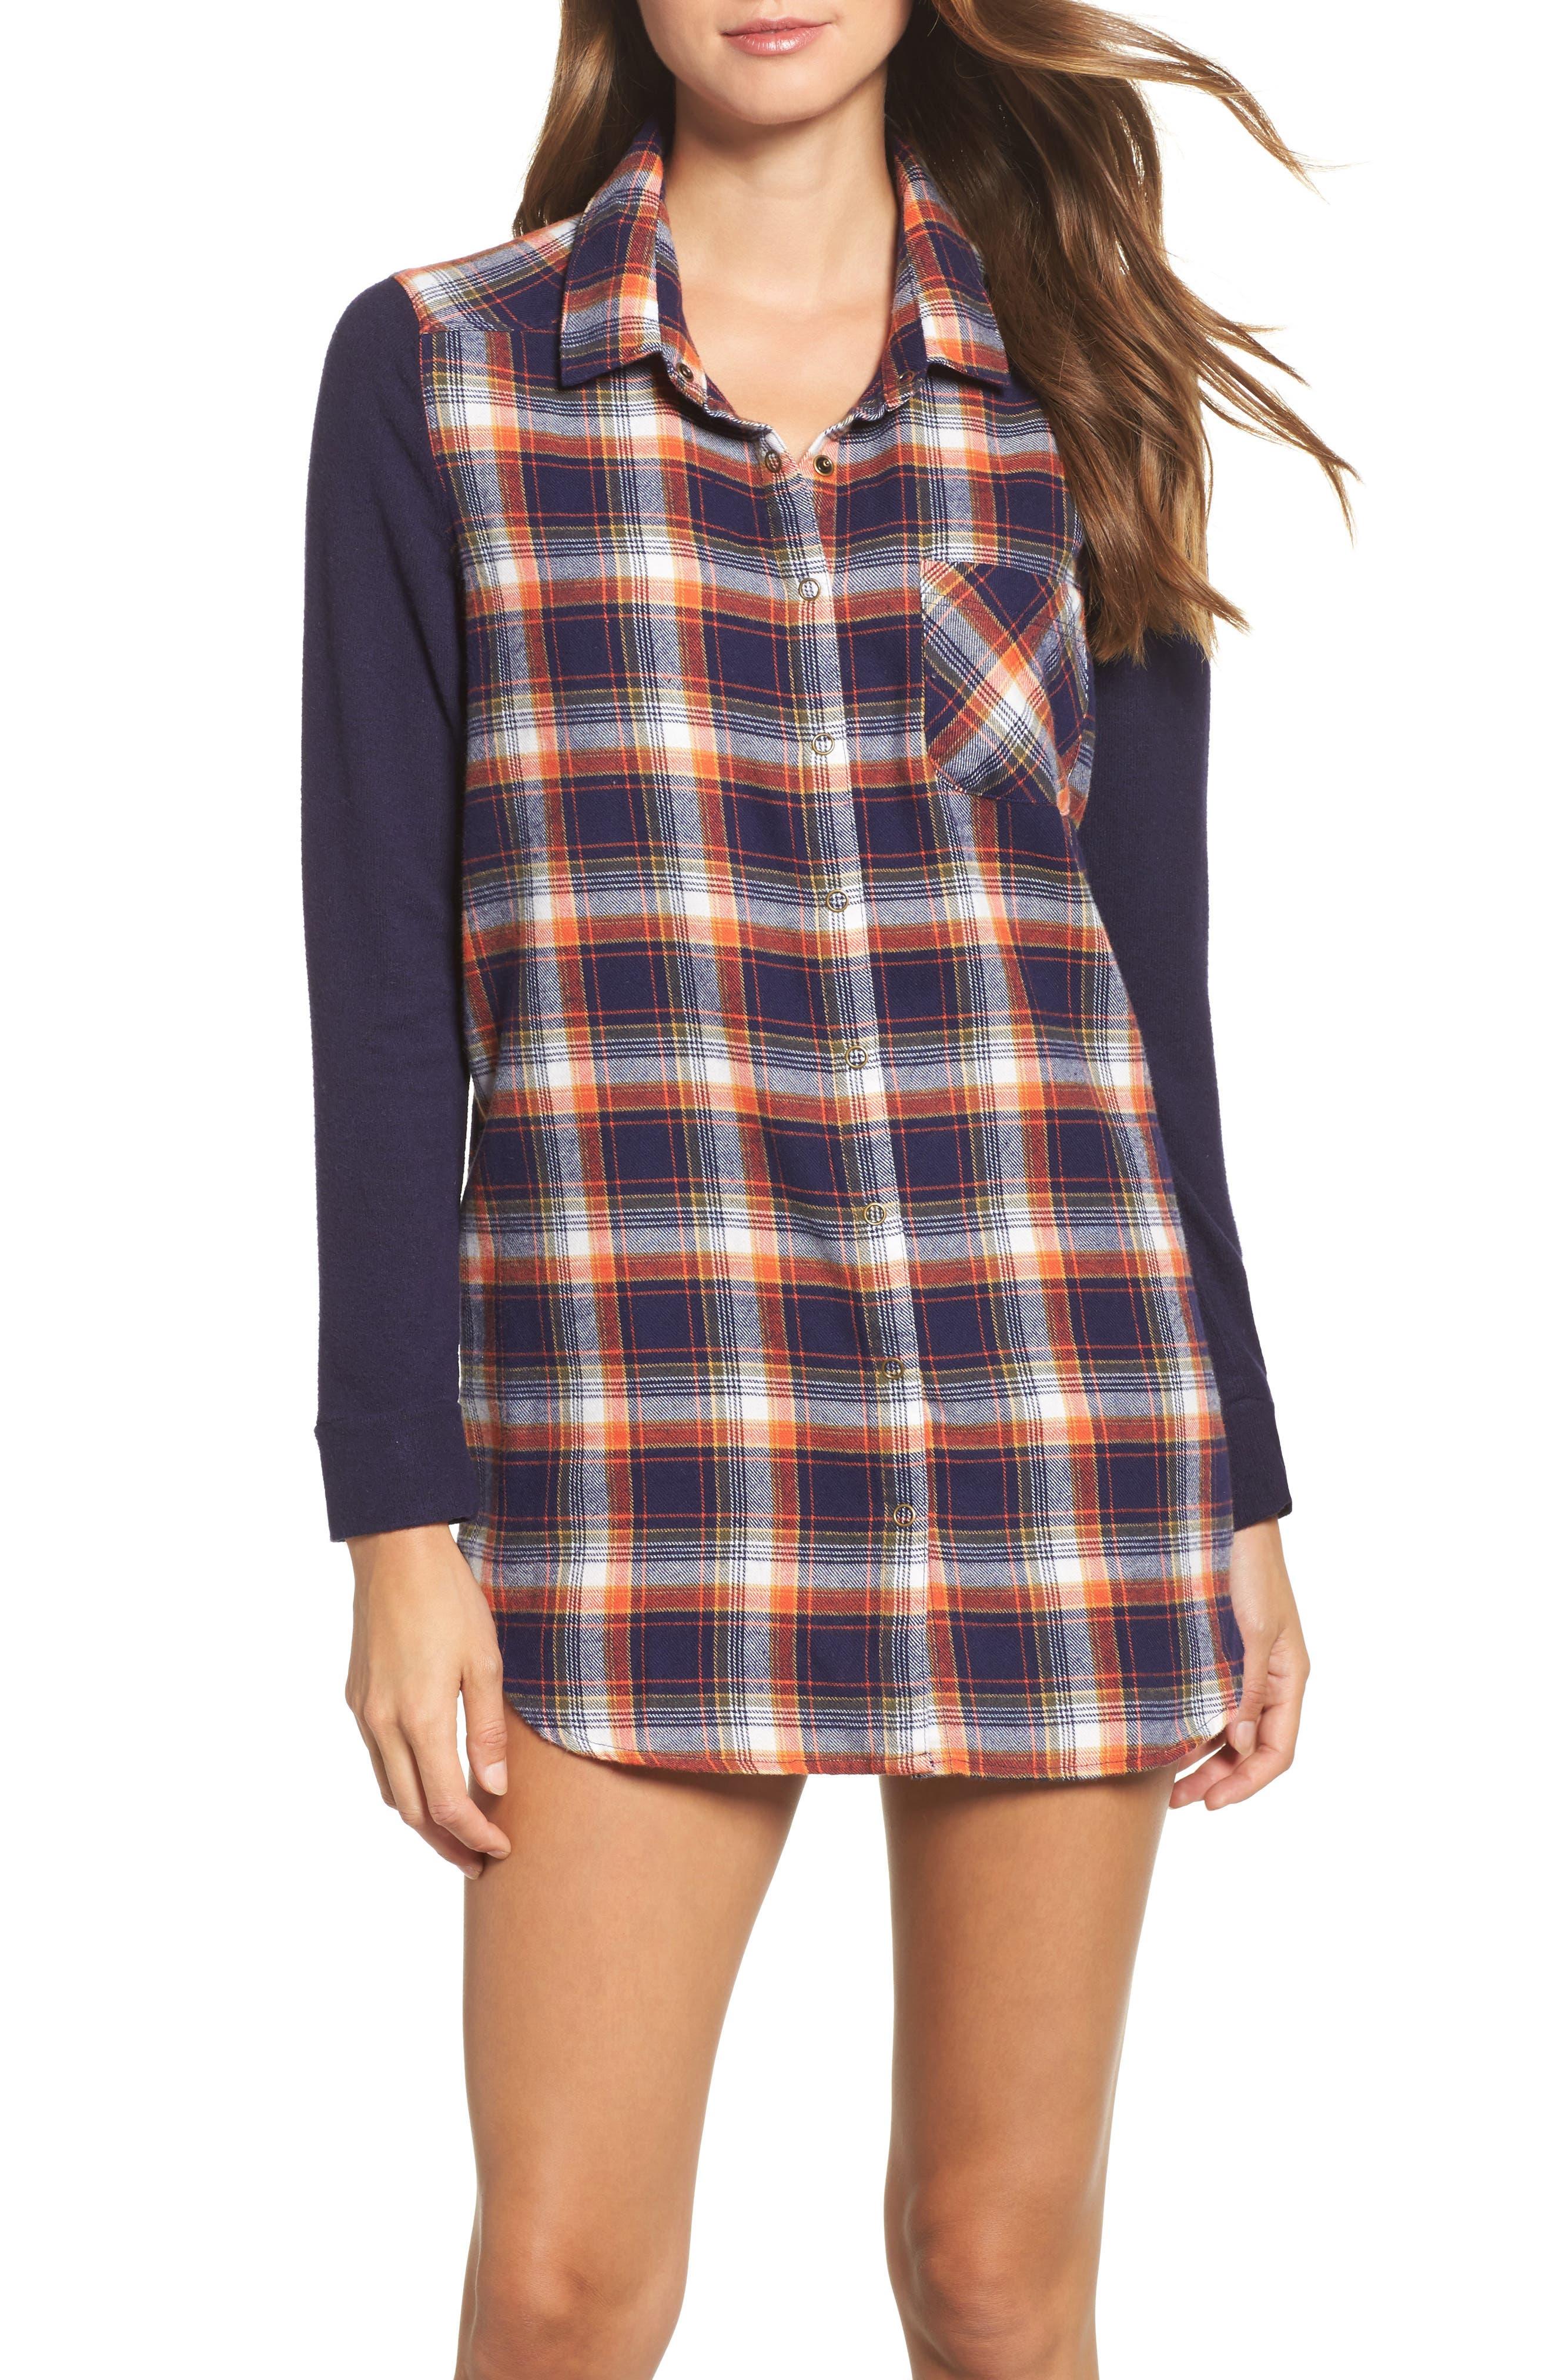 Main Image - Make + Model Flannel Nightshirt